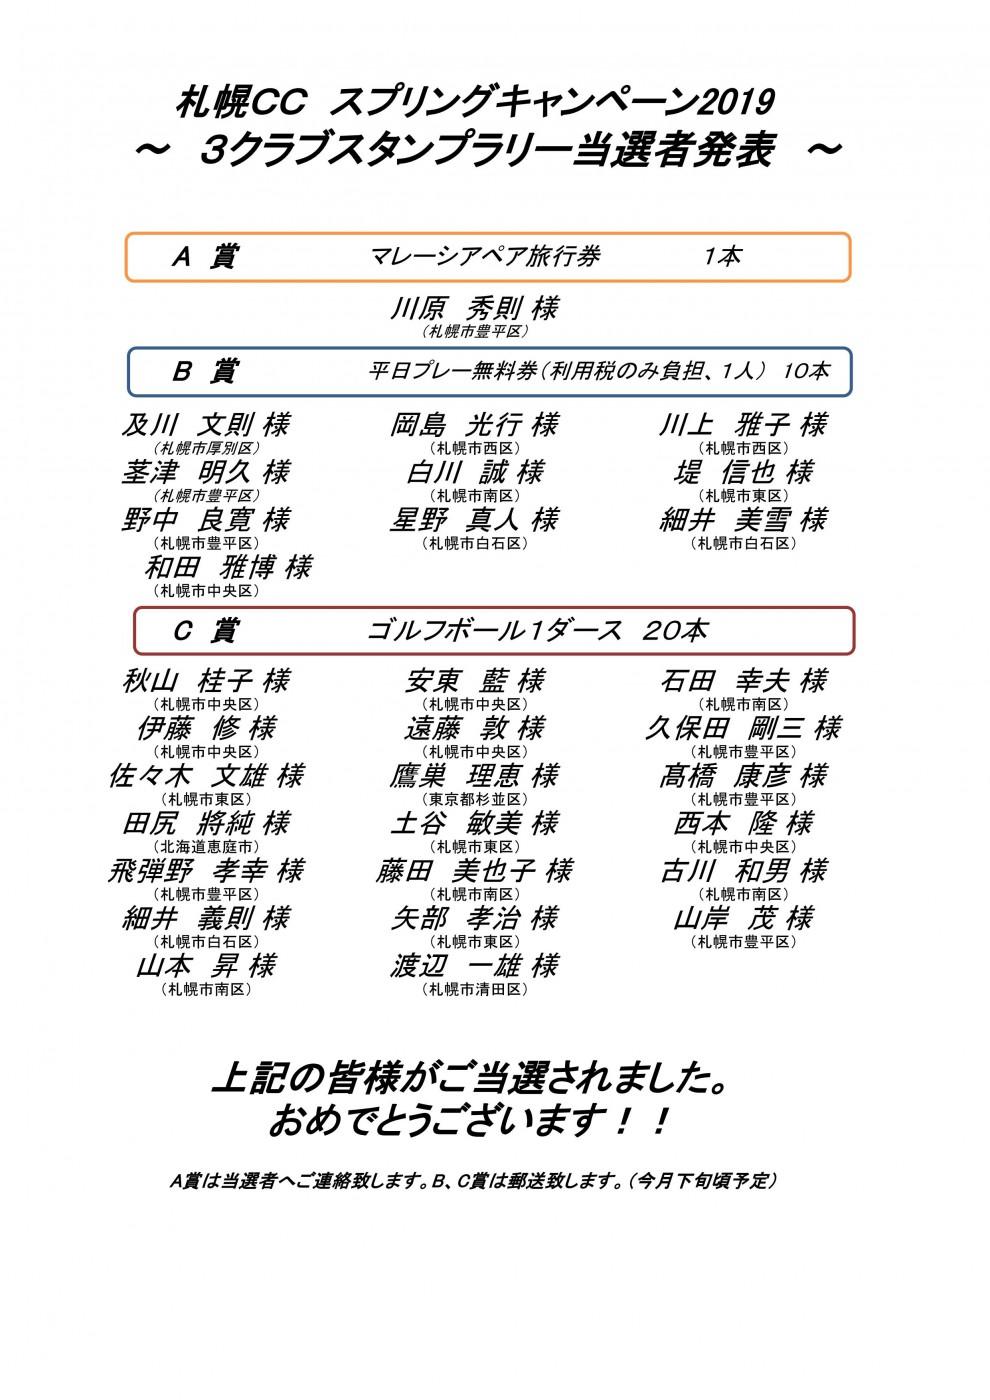 ■8/13UP スプリングキャンペーン2019 3クラブスタンプラリー当選者発表!